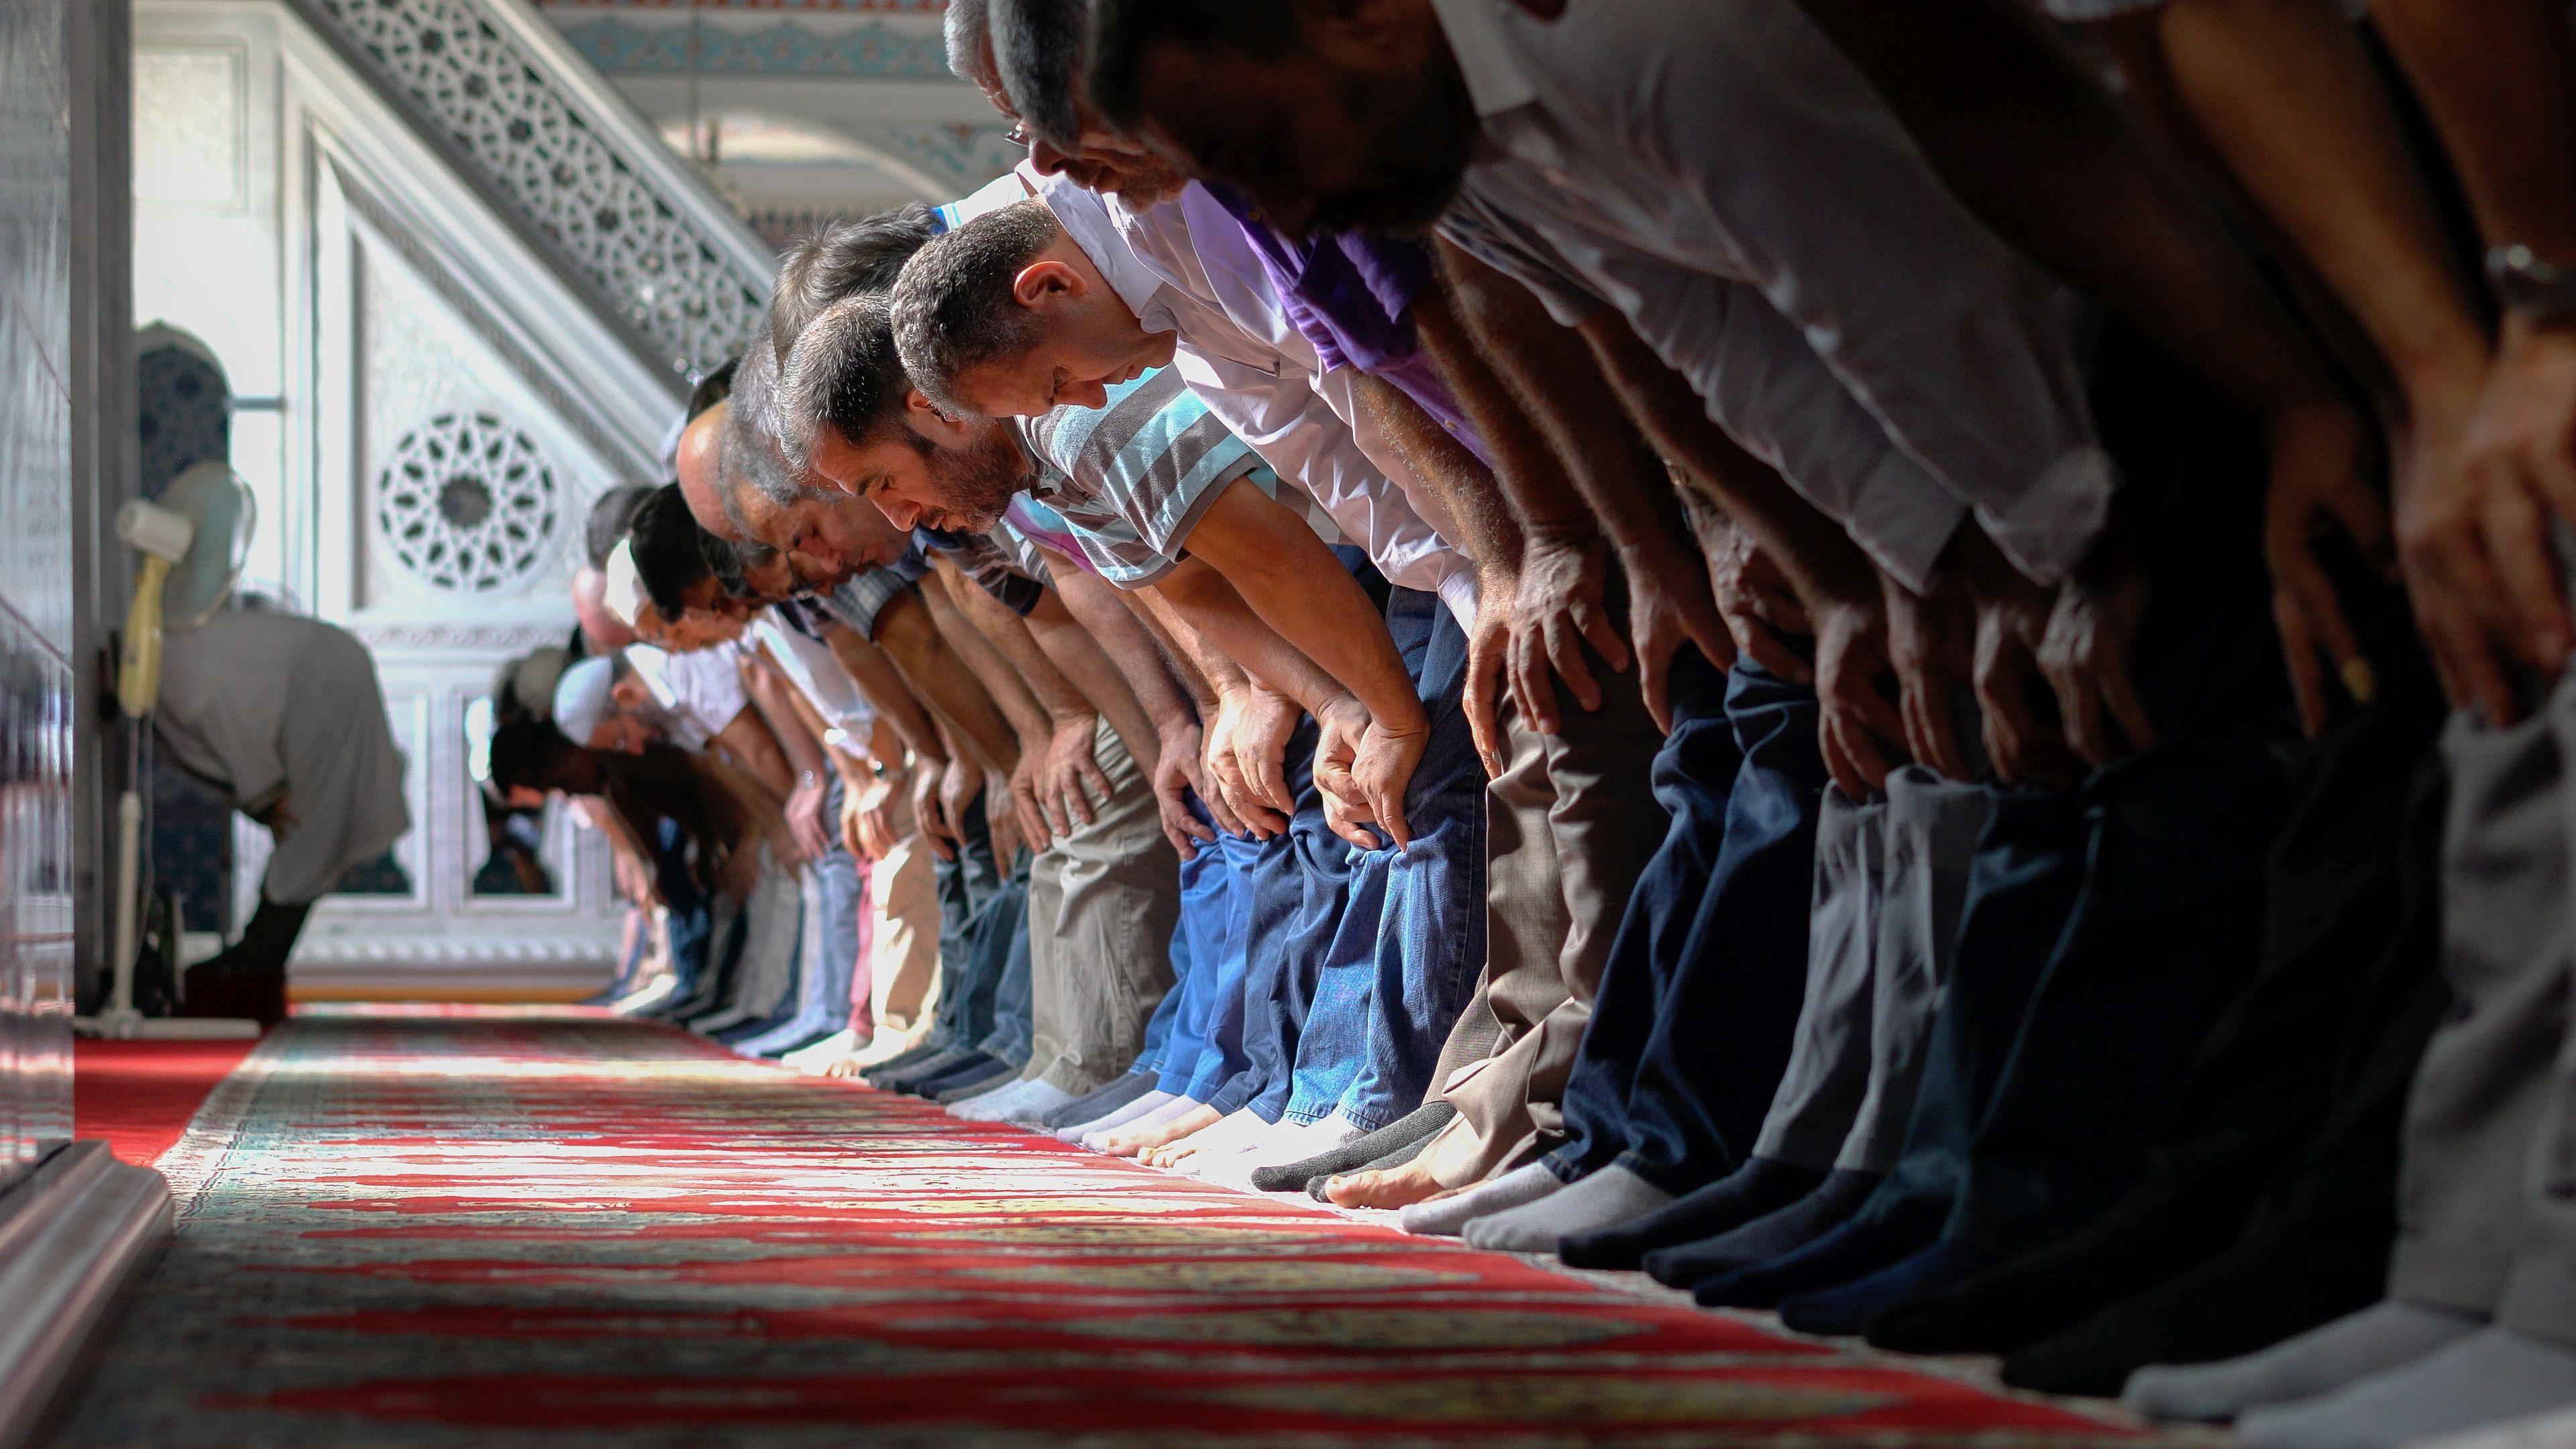 Muslim Men bowing in prayer__Sept Oct 20